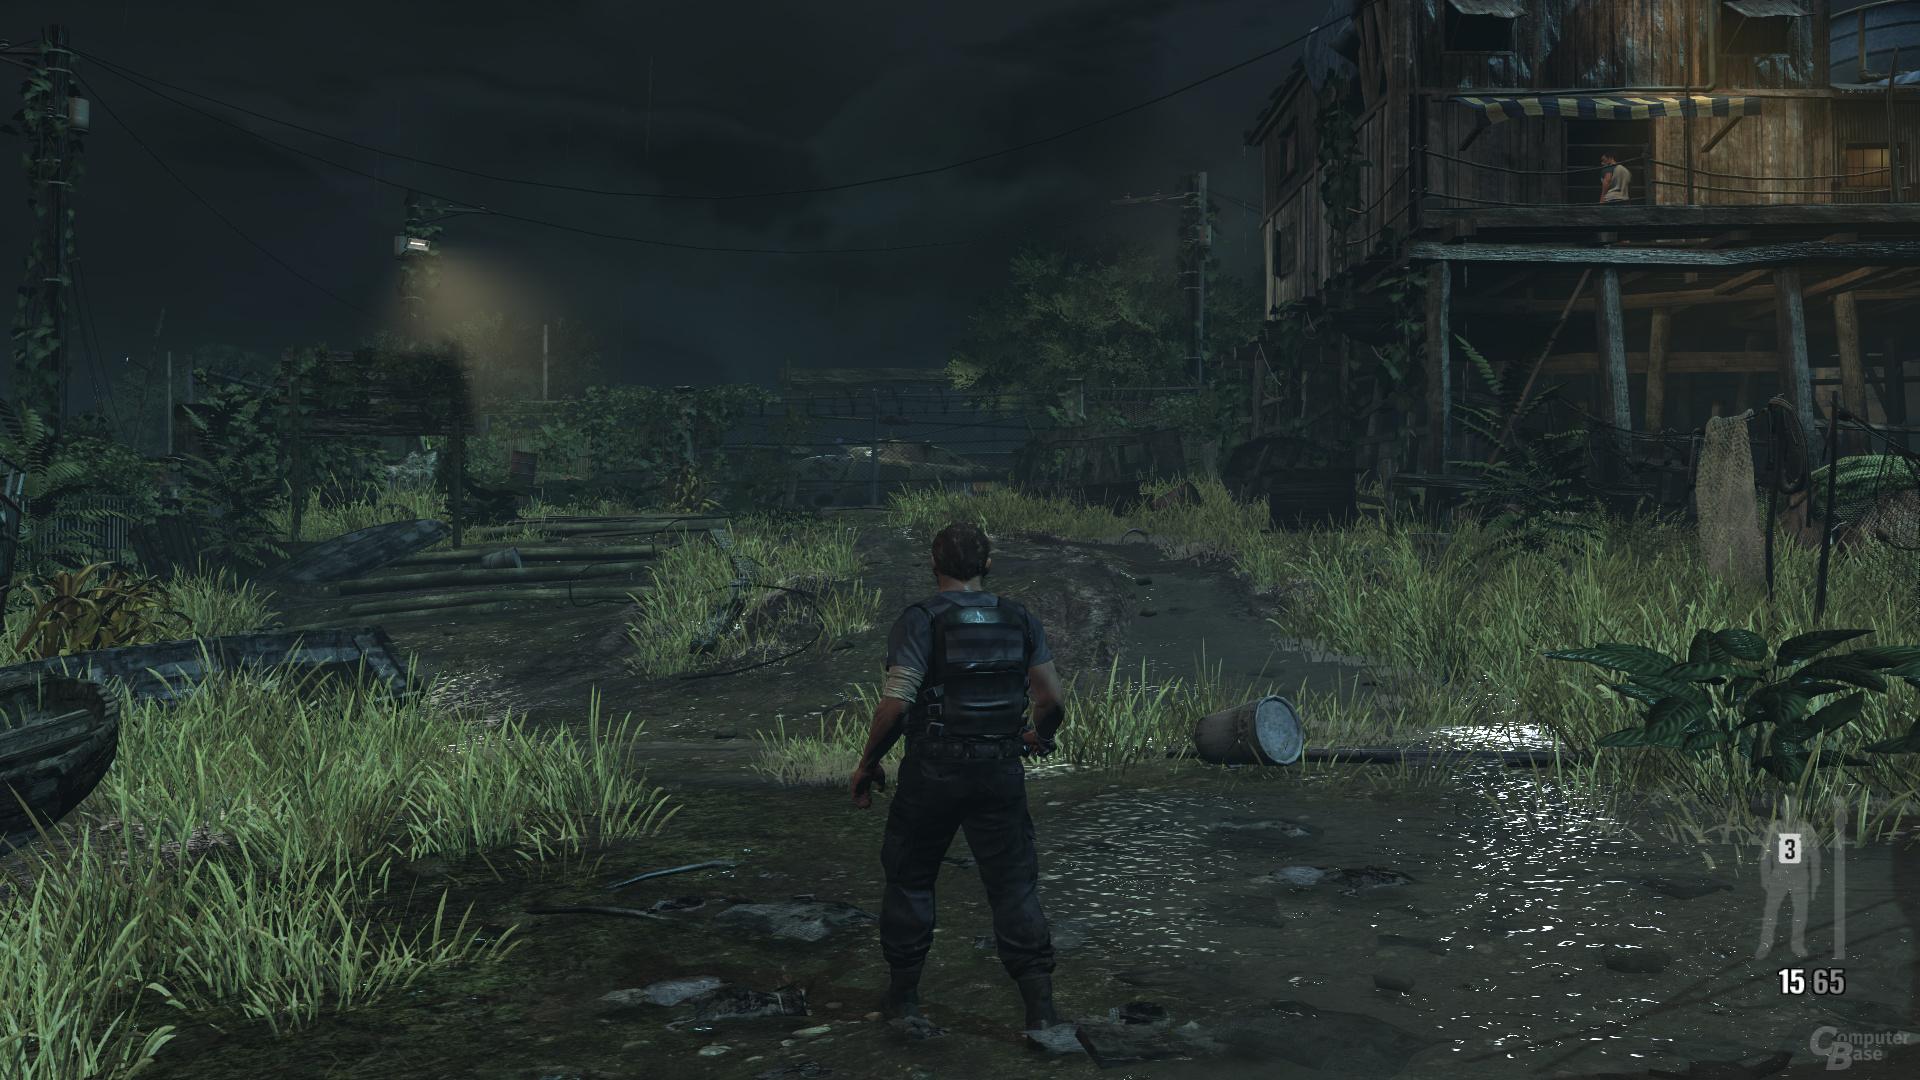 AMD GCN - Max Payne 3